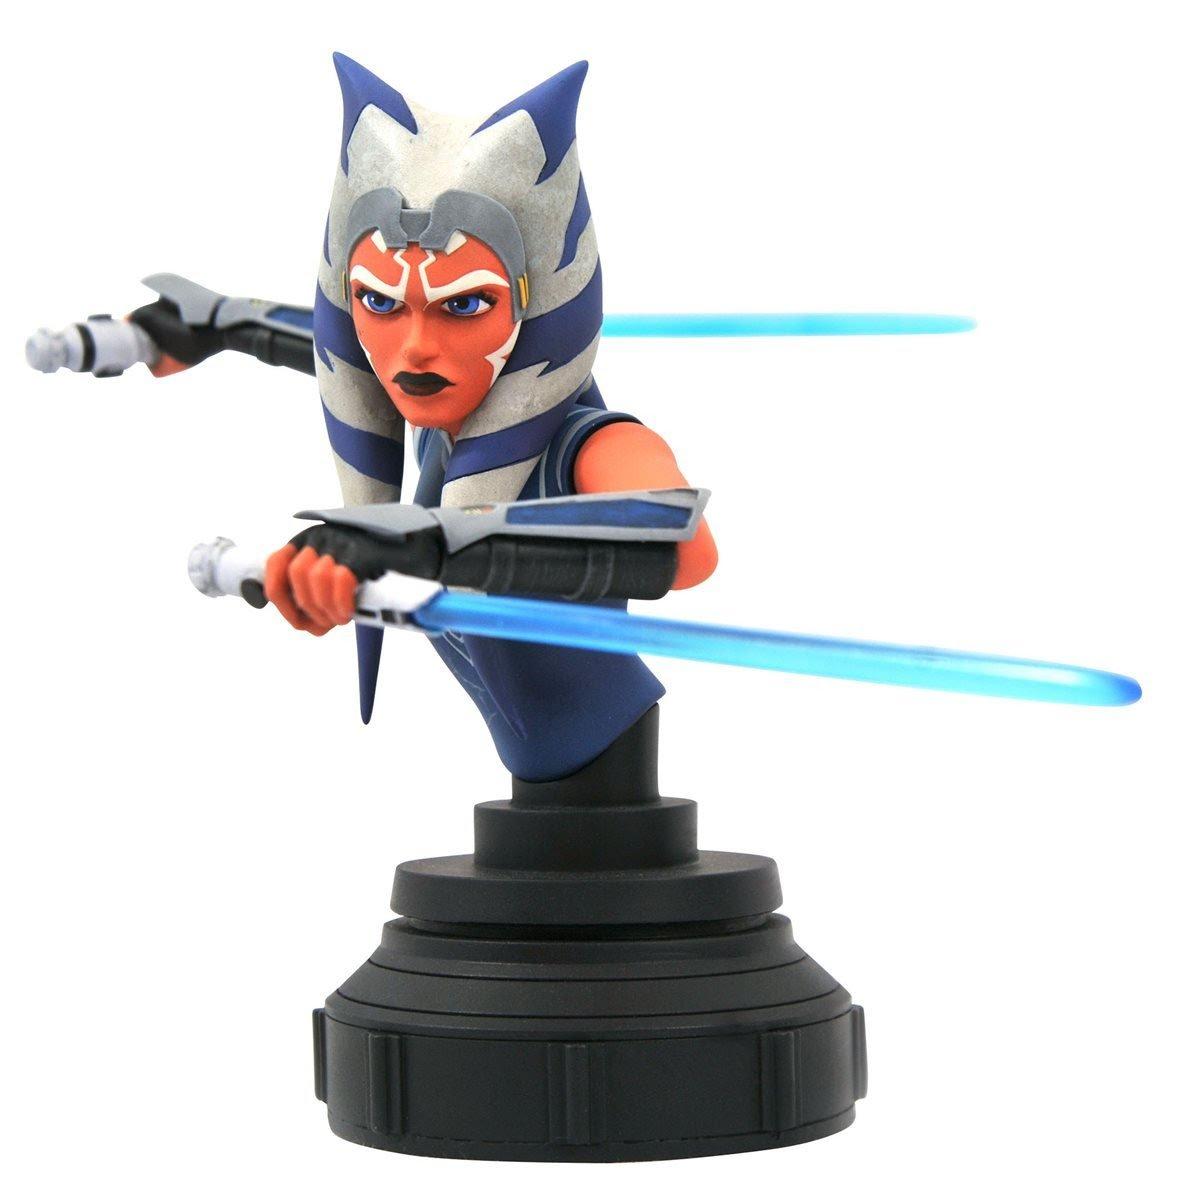 Star Wars - Clone Wars - Ahsoka 1-7 Scale Bust